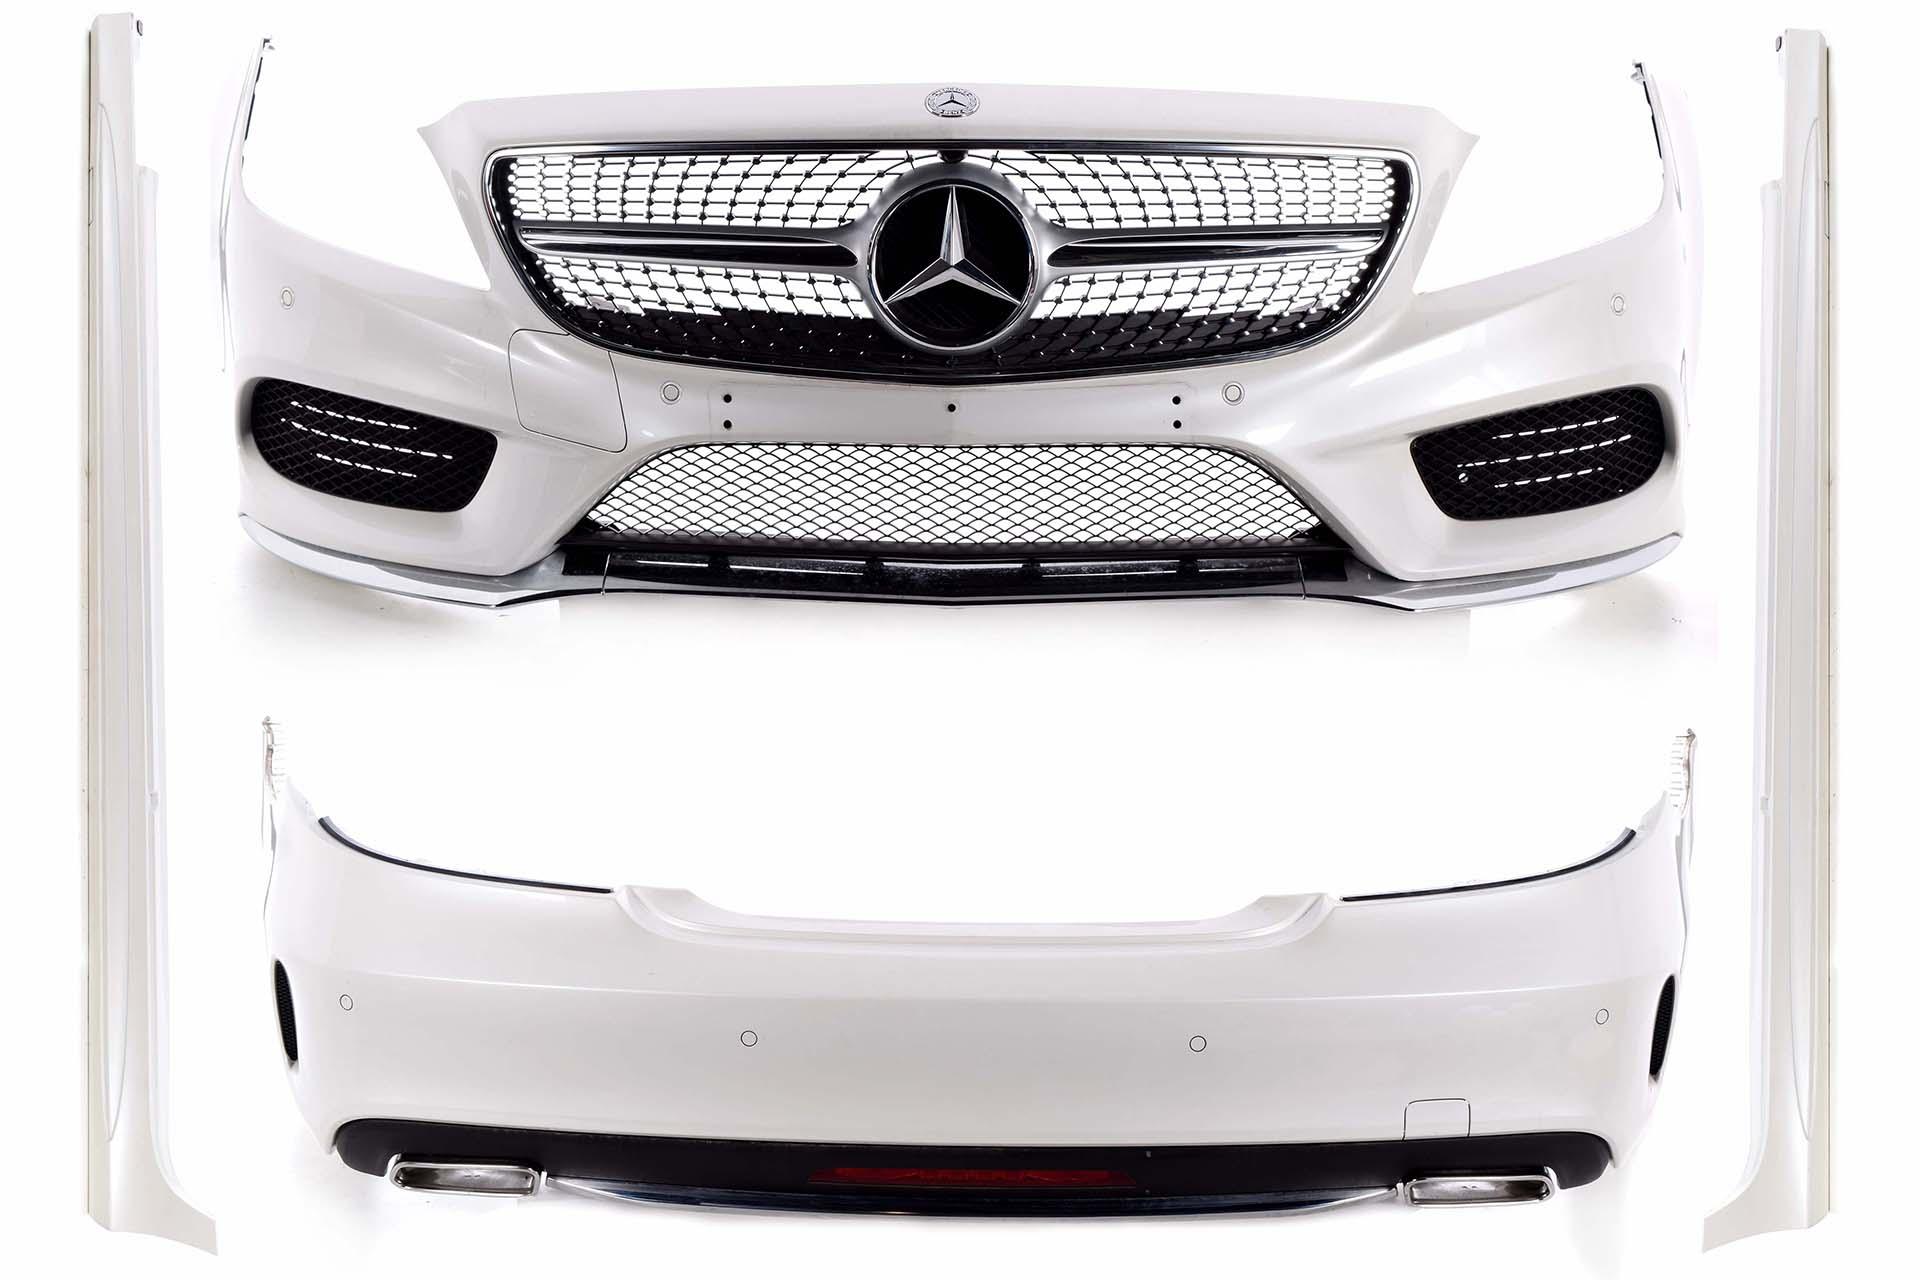 Mercedes-Benz original CLS Coupe 218 AMG Styling Teilepaket ...